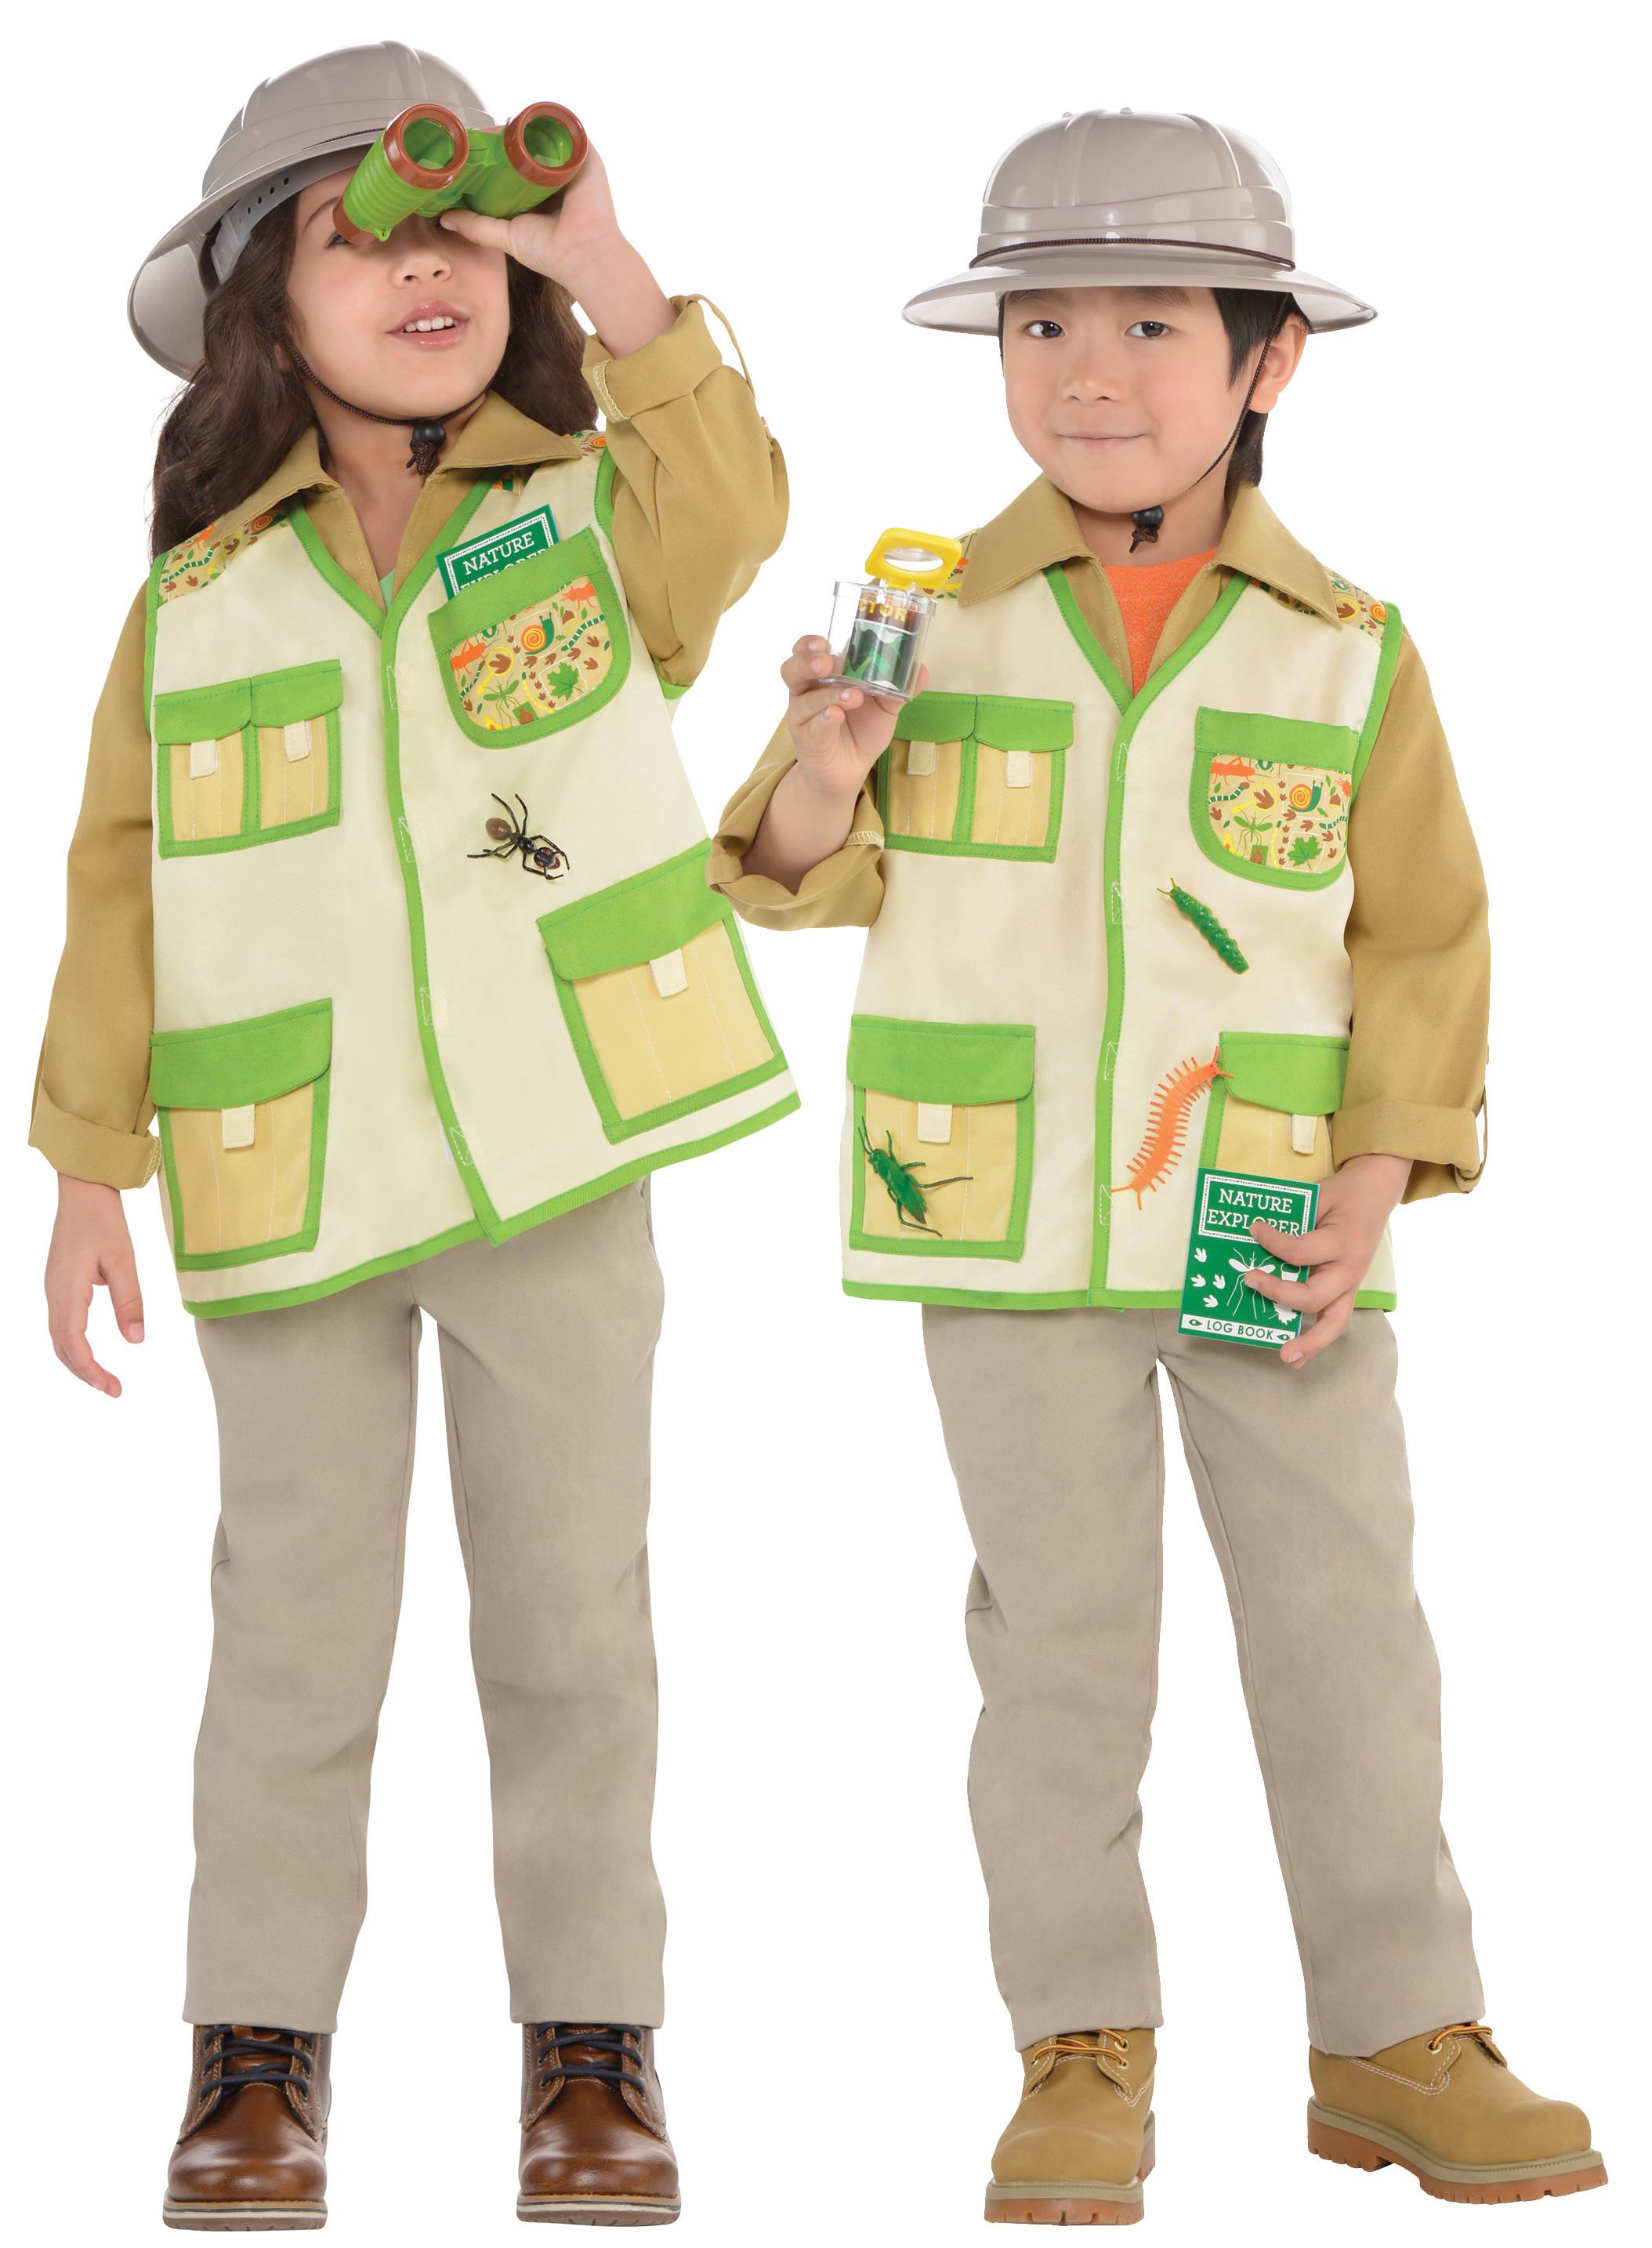 Explorer Kids Costume Kit | Letter u0026quot;Eu0026quot; Costumes | Mega Fancy Dress